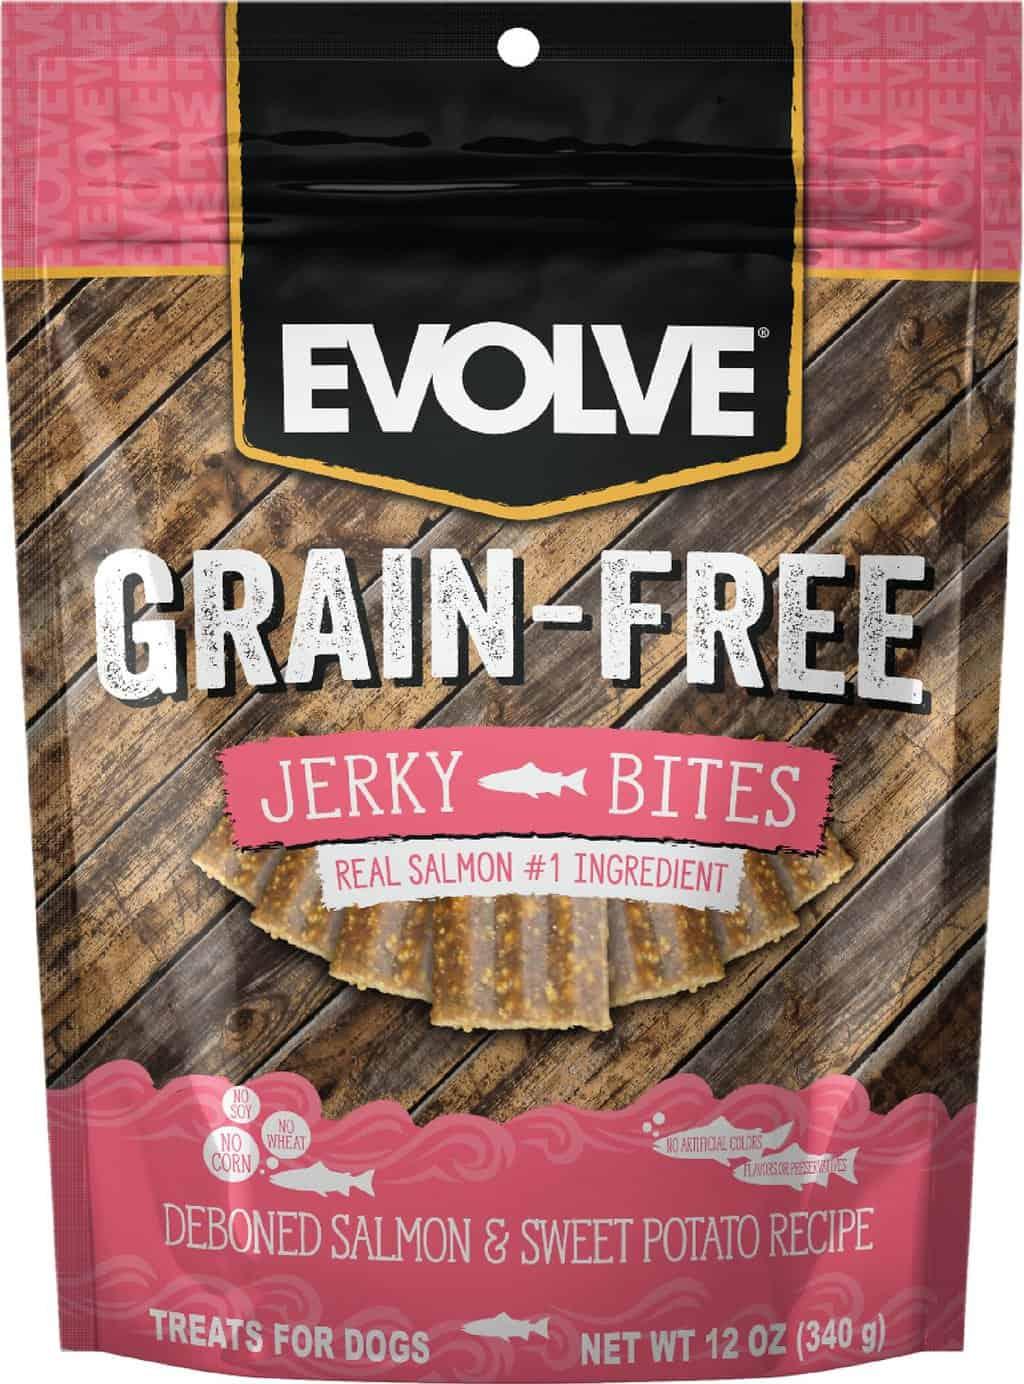 Evolve Dog Food Reviews [year]: Best Affordable, Premium Pet Food? 28